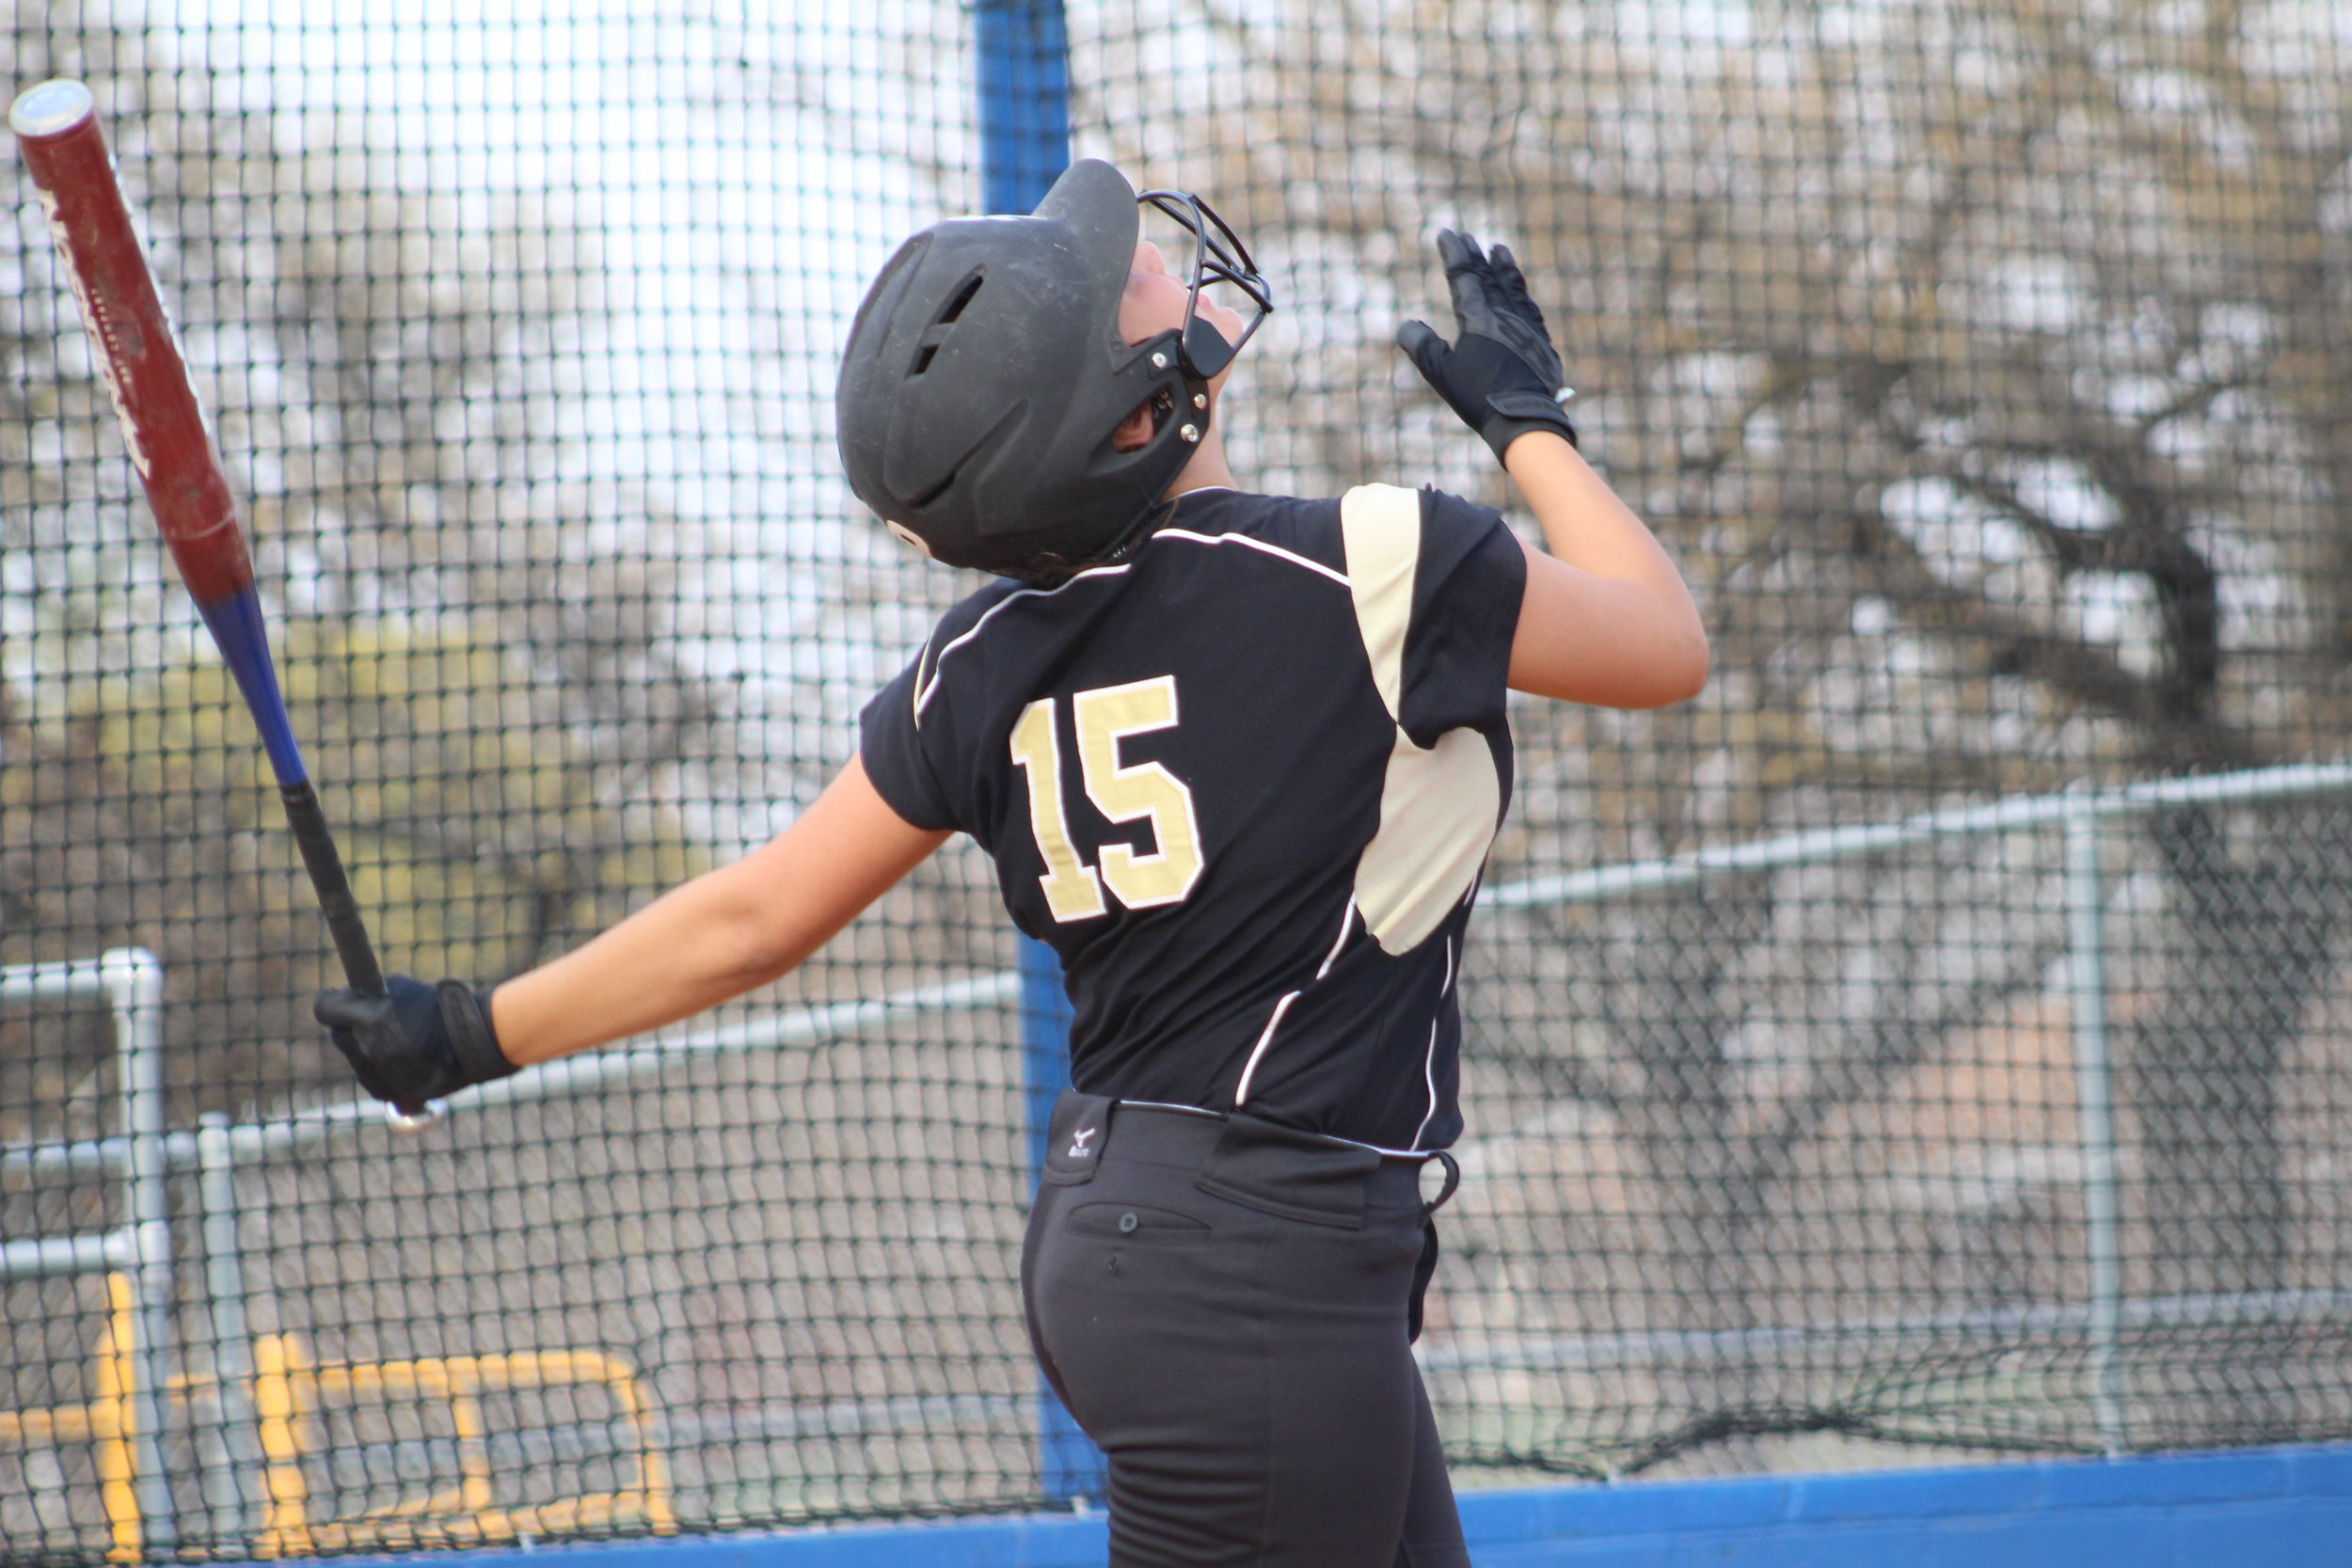 Rachel Jones led the Lady Sandites with three runs in their season opener. (Photo: Scott Emigh).